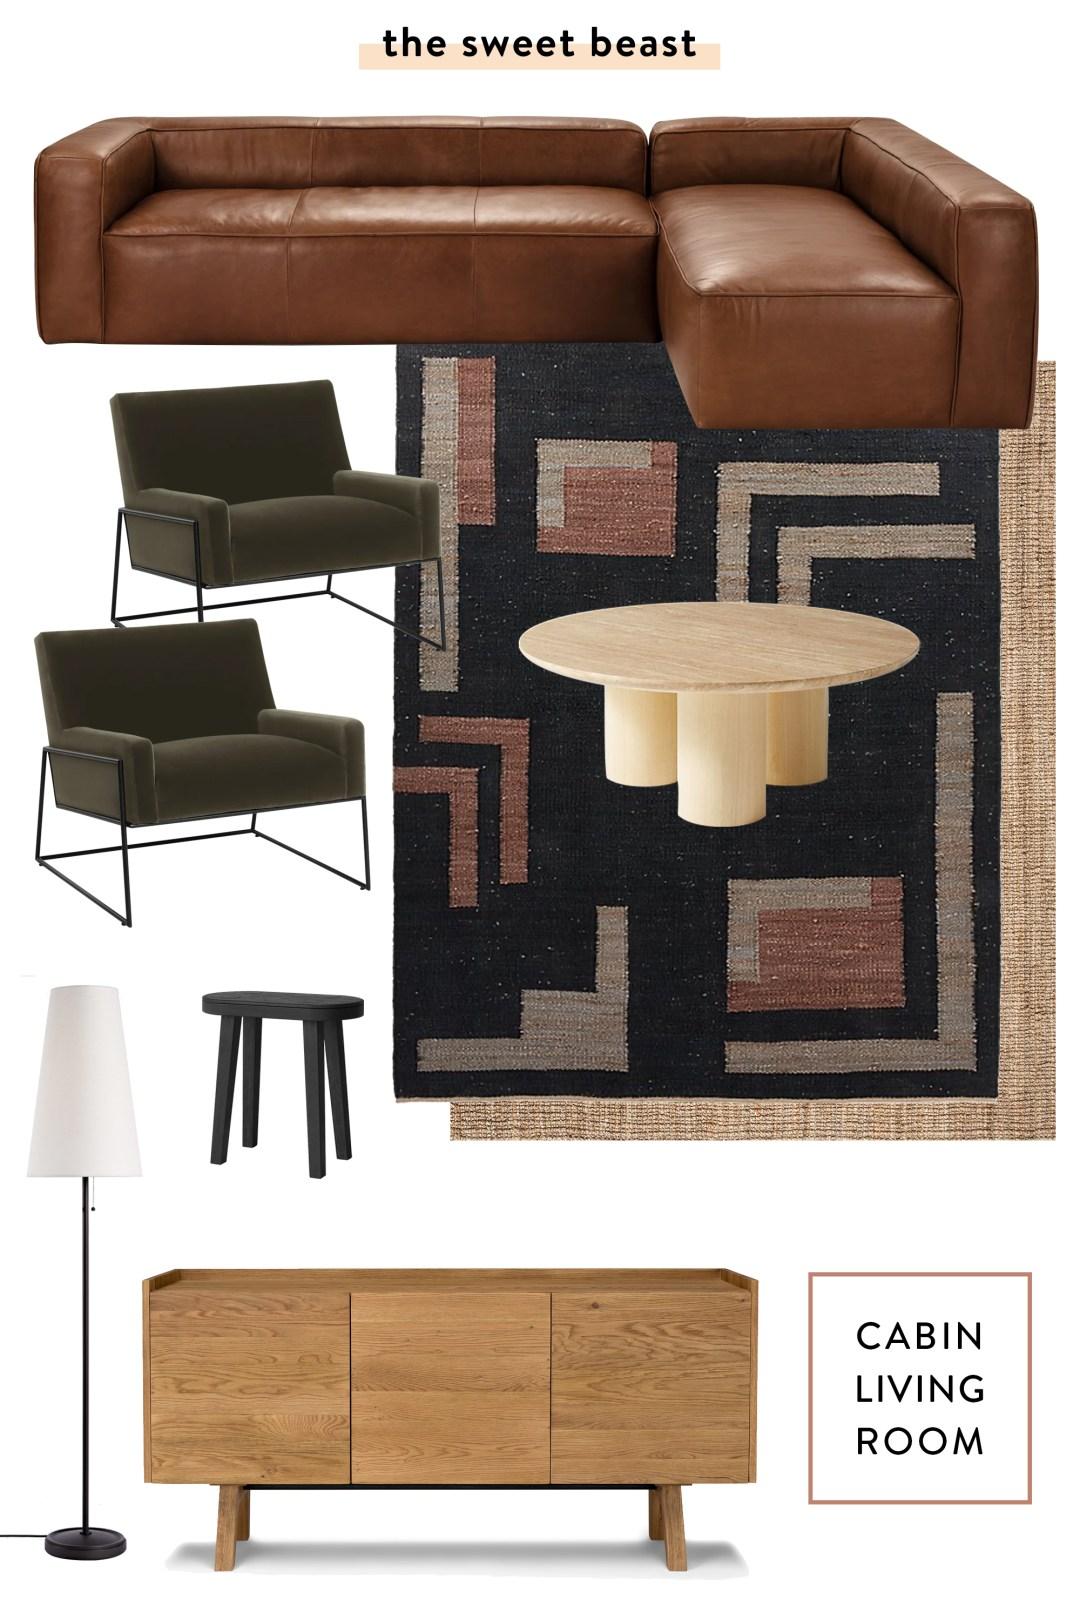 Cabin Living Room Mood Board